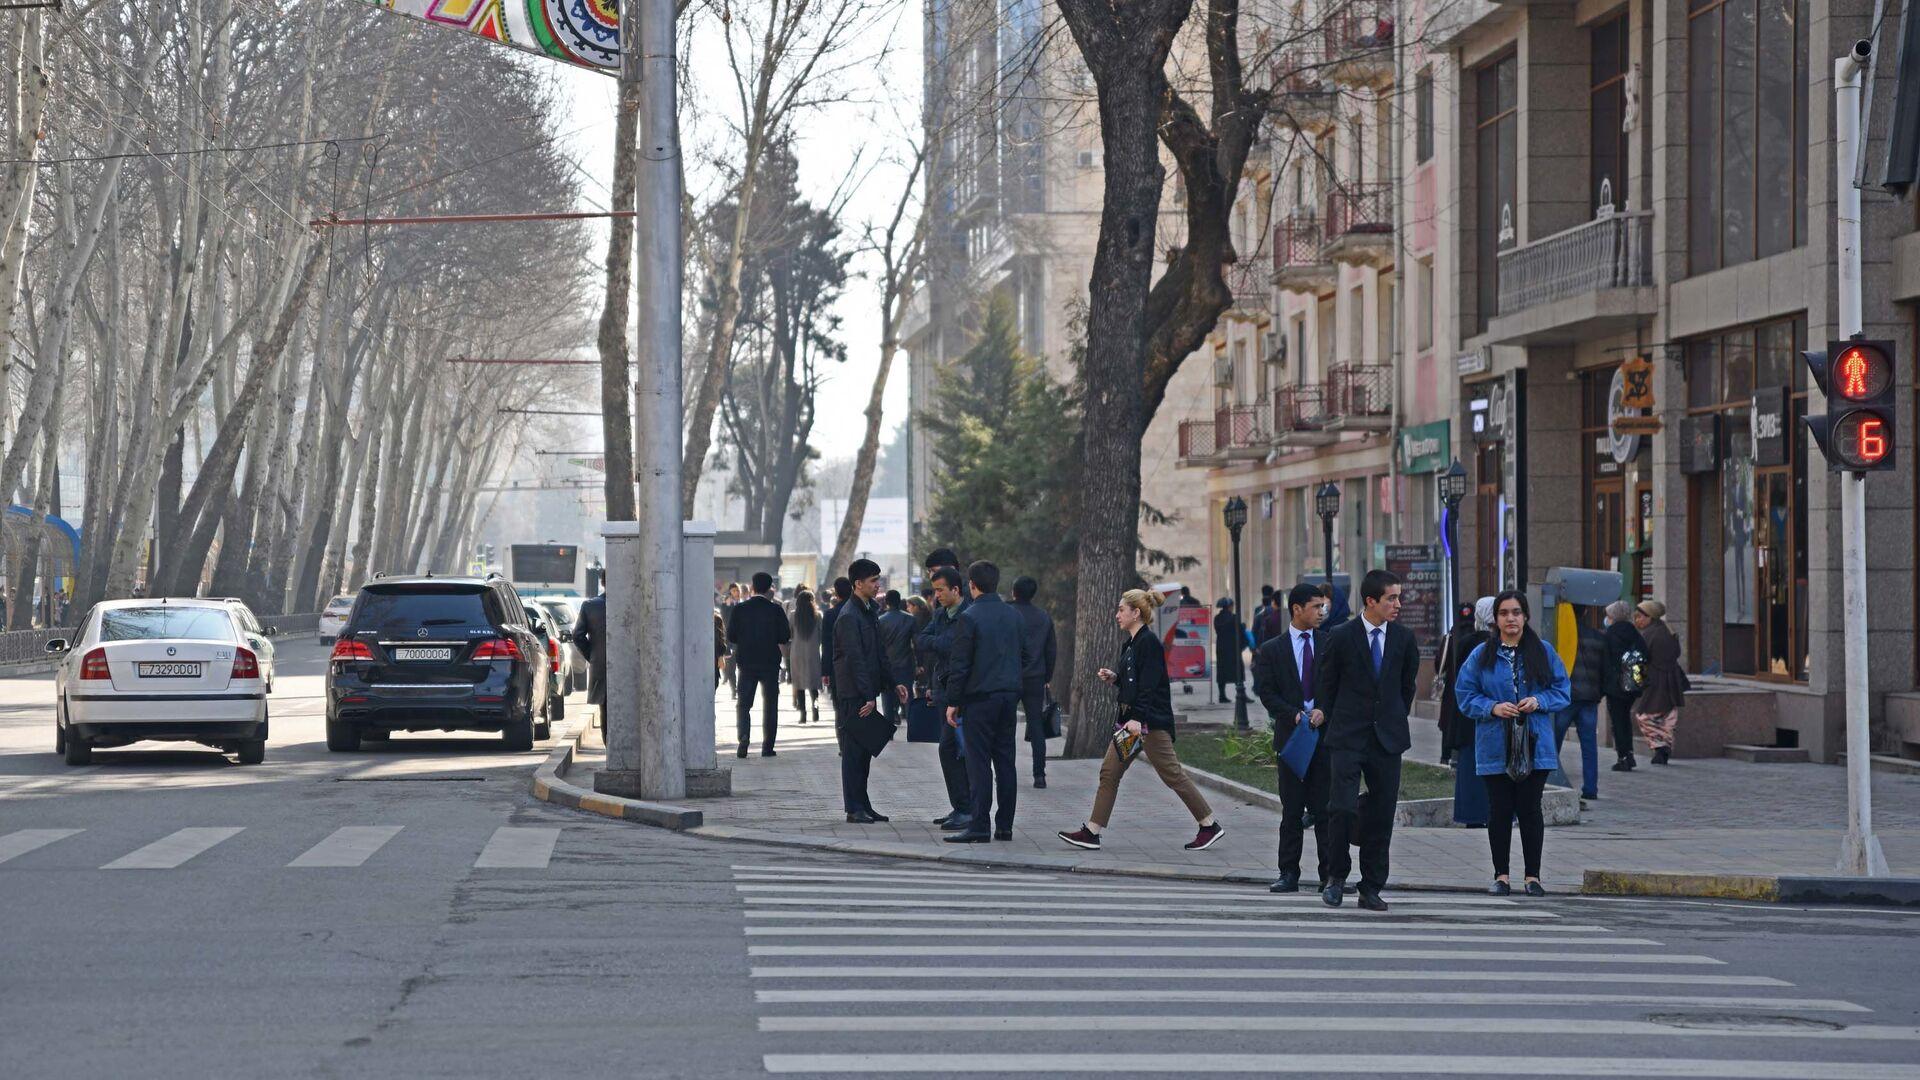 Пешеходы на улице - Sputnik Таджикистан, 1920, 13.10.2021